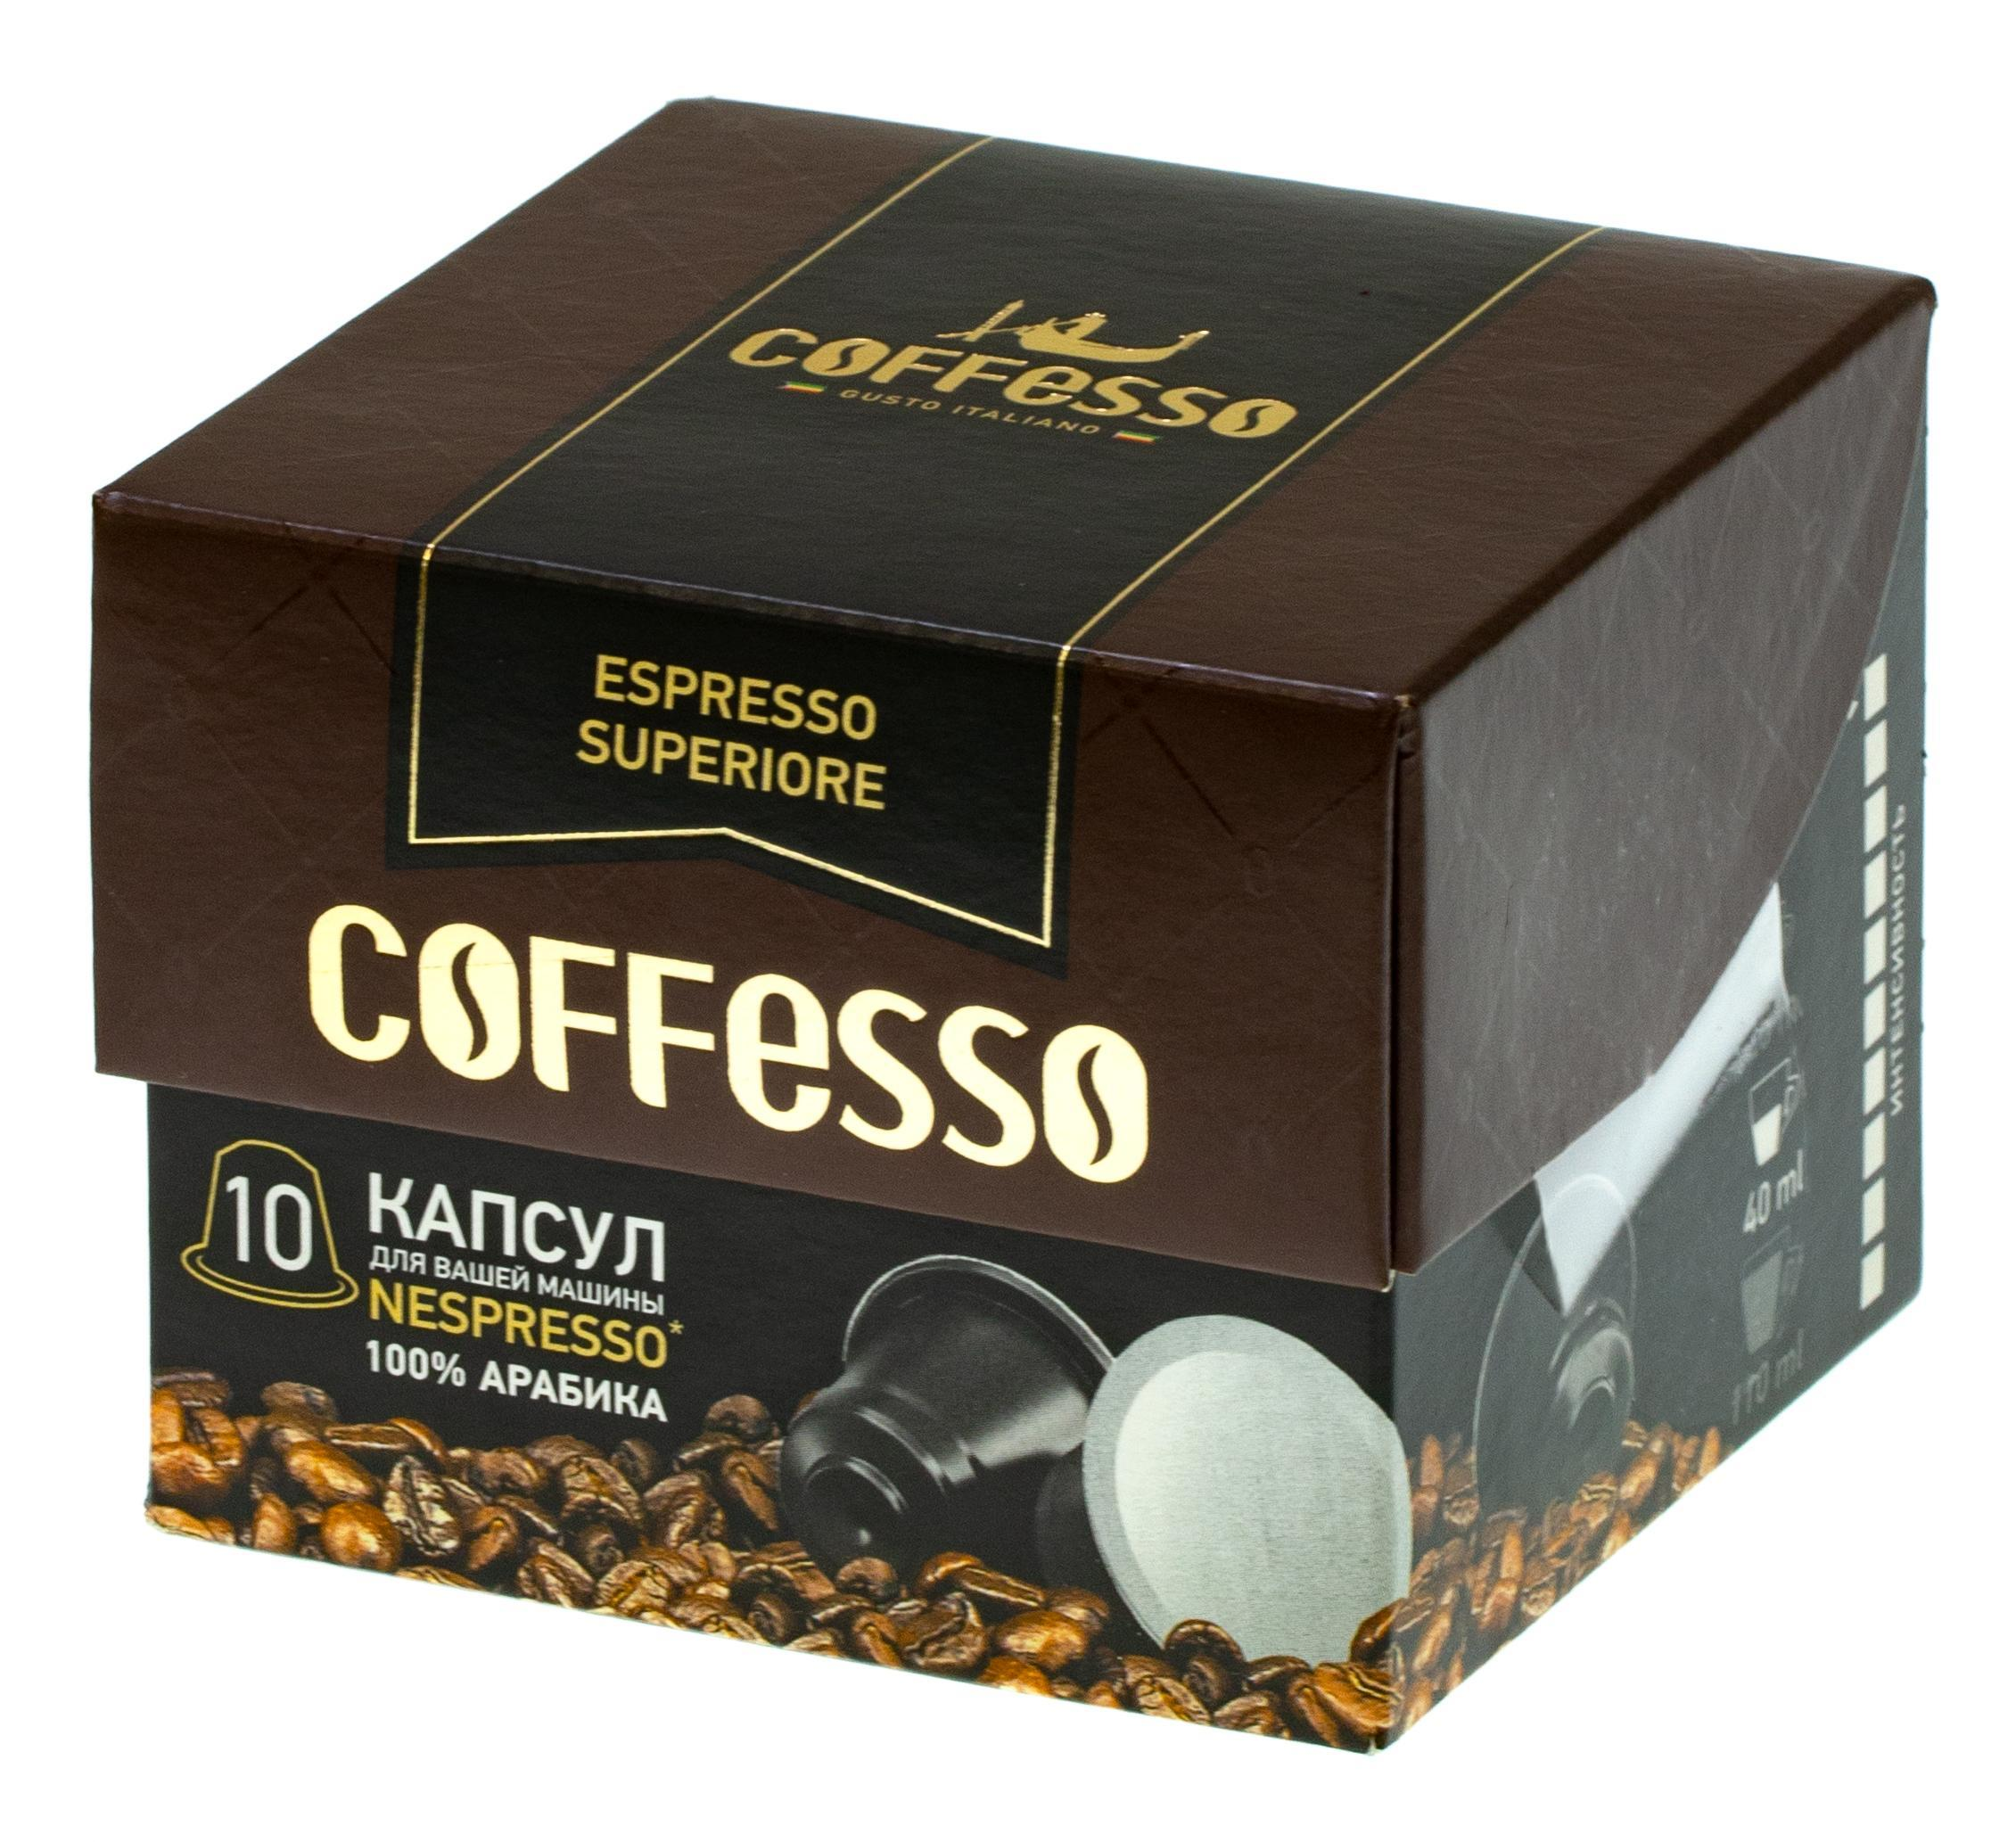 Кофе Coffesso Espresso Superiore капсулы 50 г.